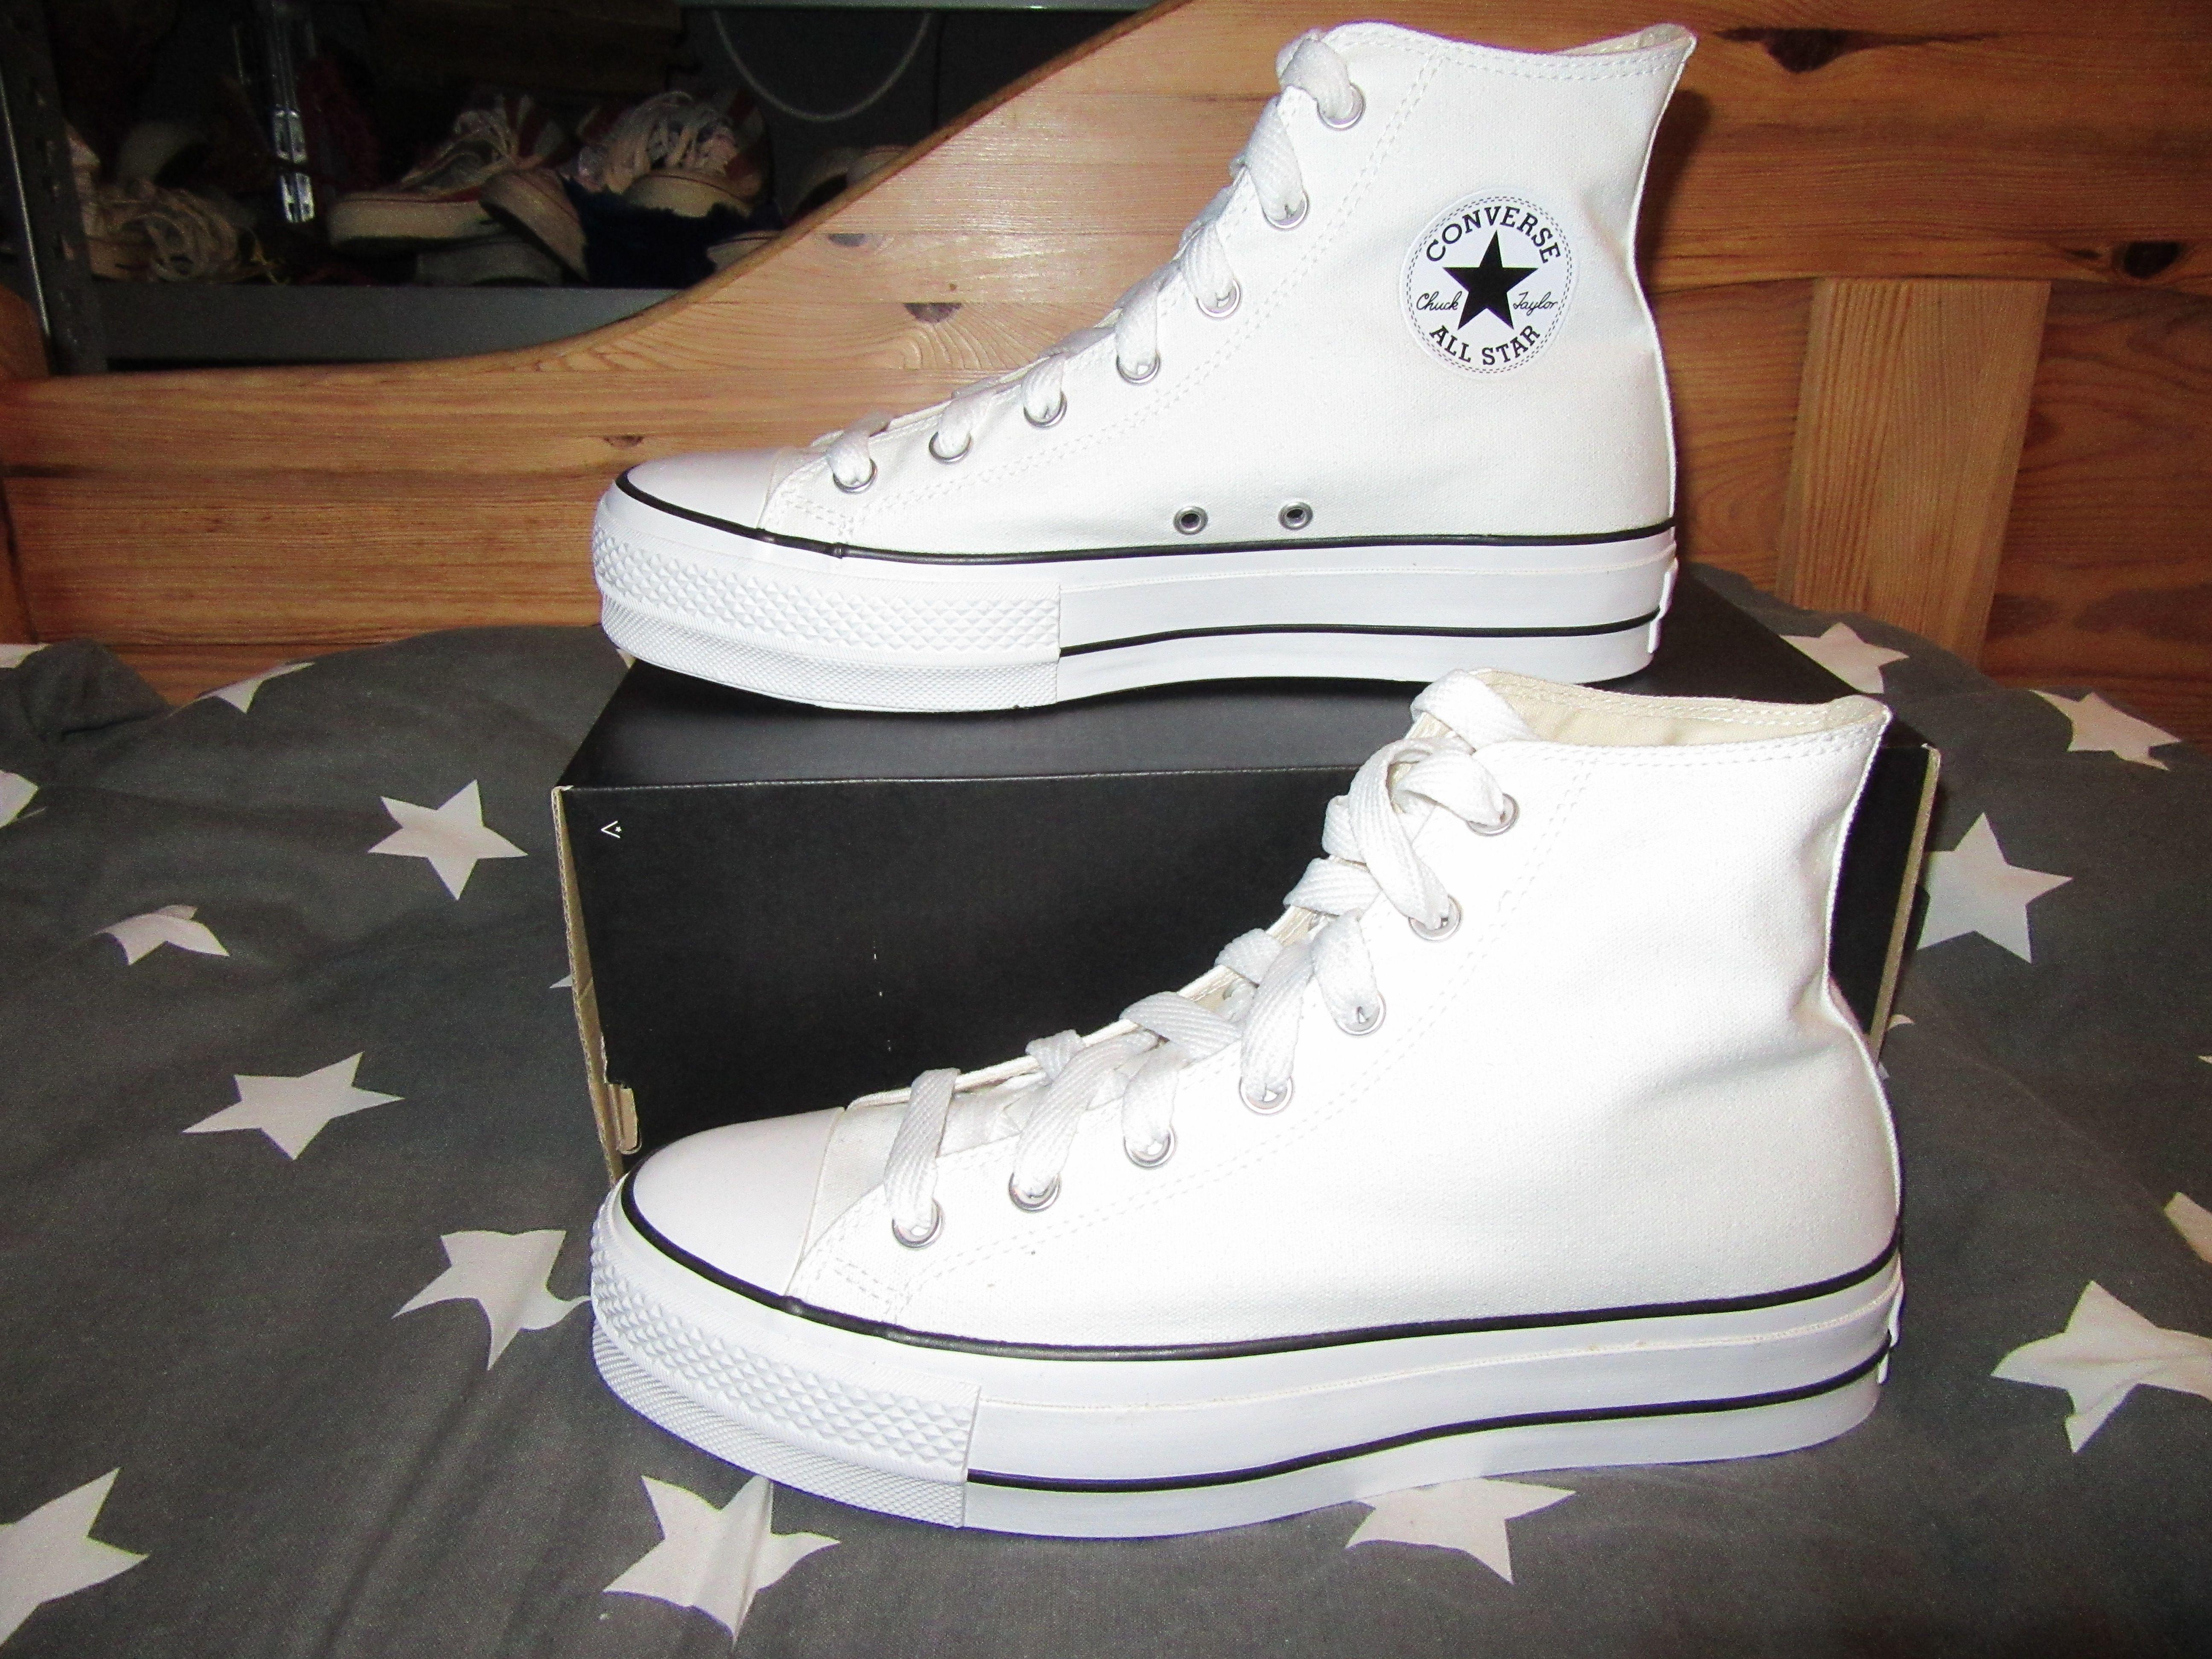 Converse All Star Lift White 560846C